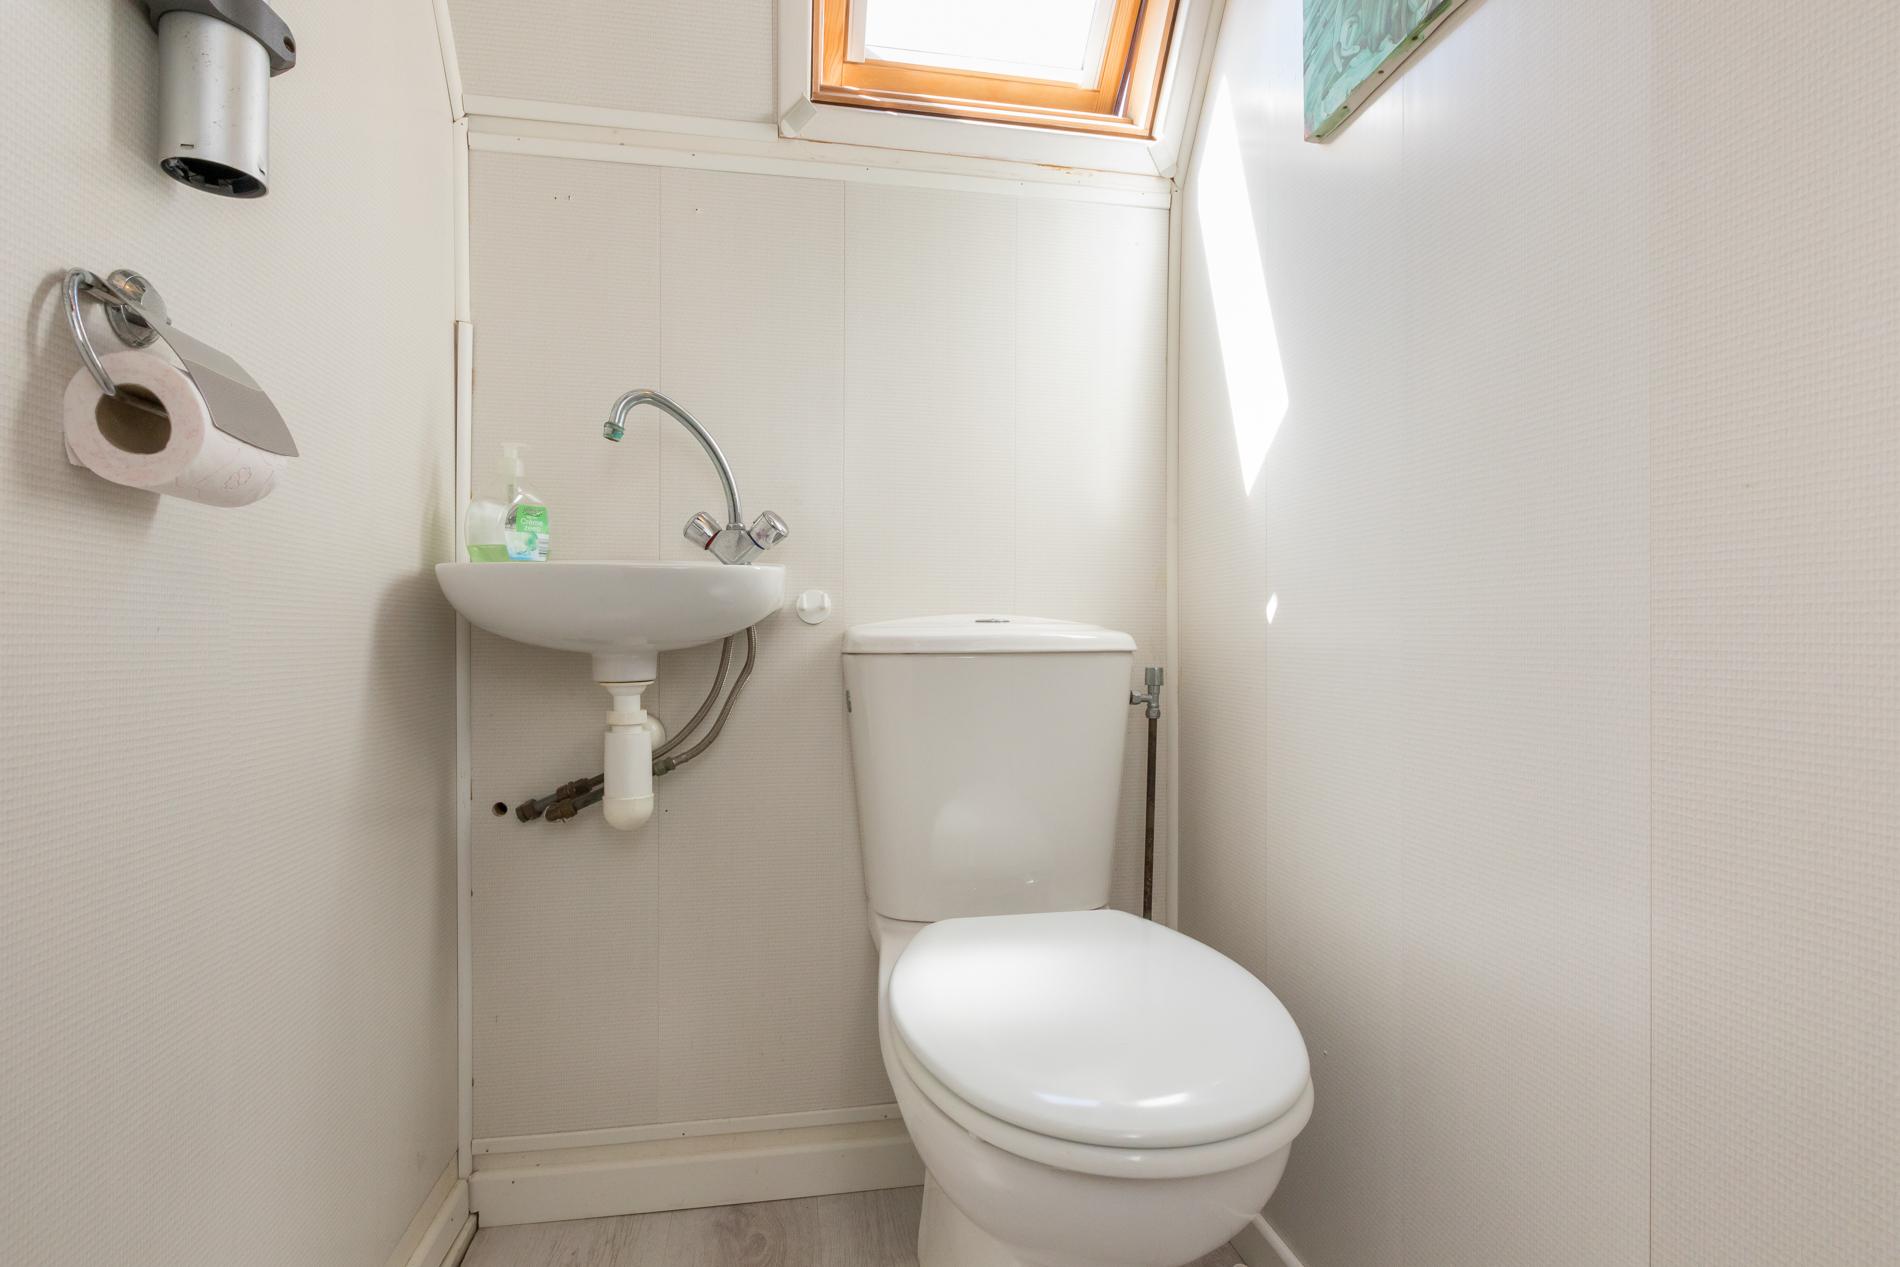 Toilet  Berghoekstraat 6 Kruiningen ism makelaars